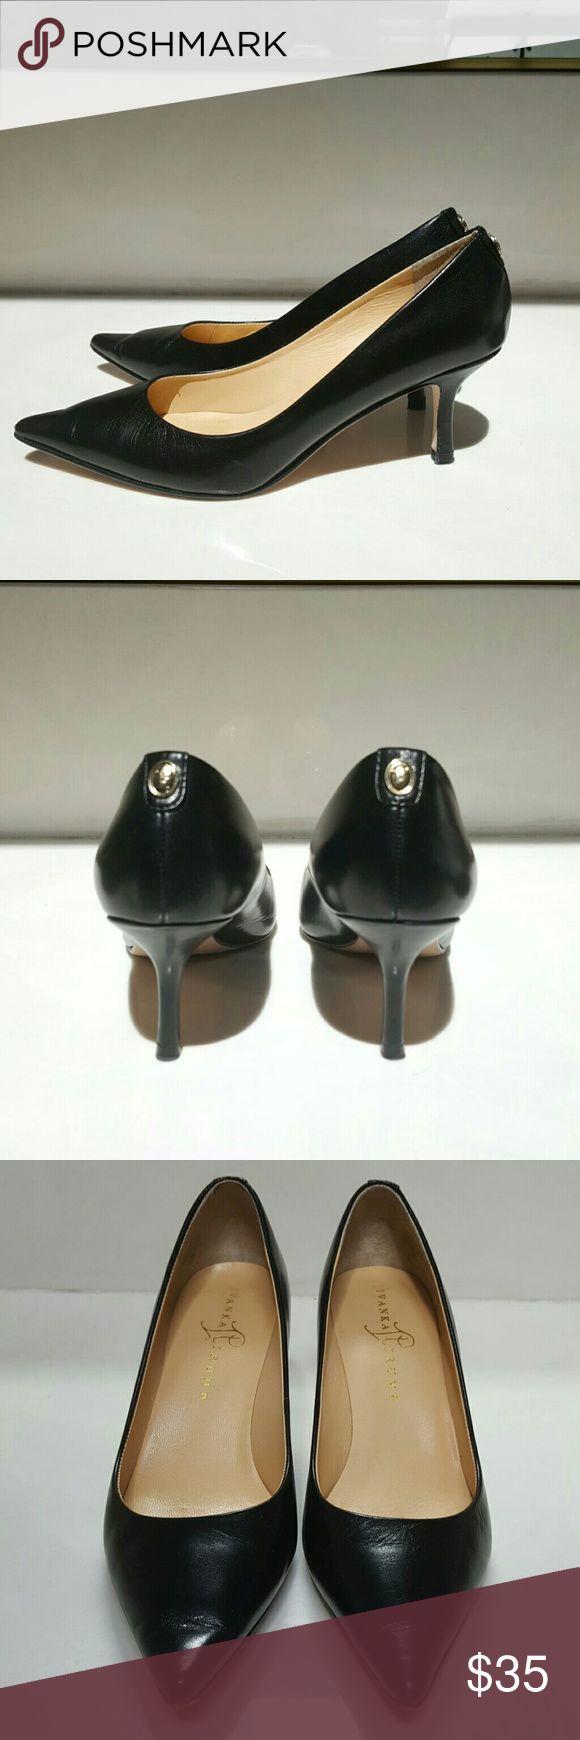 Awesome Ivanka Trump Black Pumps | Ivanka trump pumps, Ivanka trump shoes  and Ivanka trump